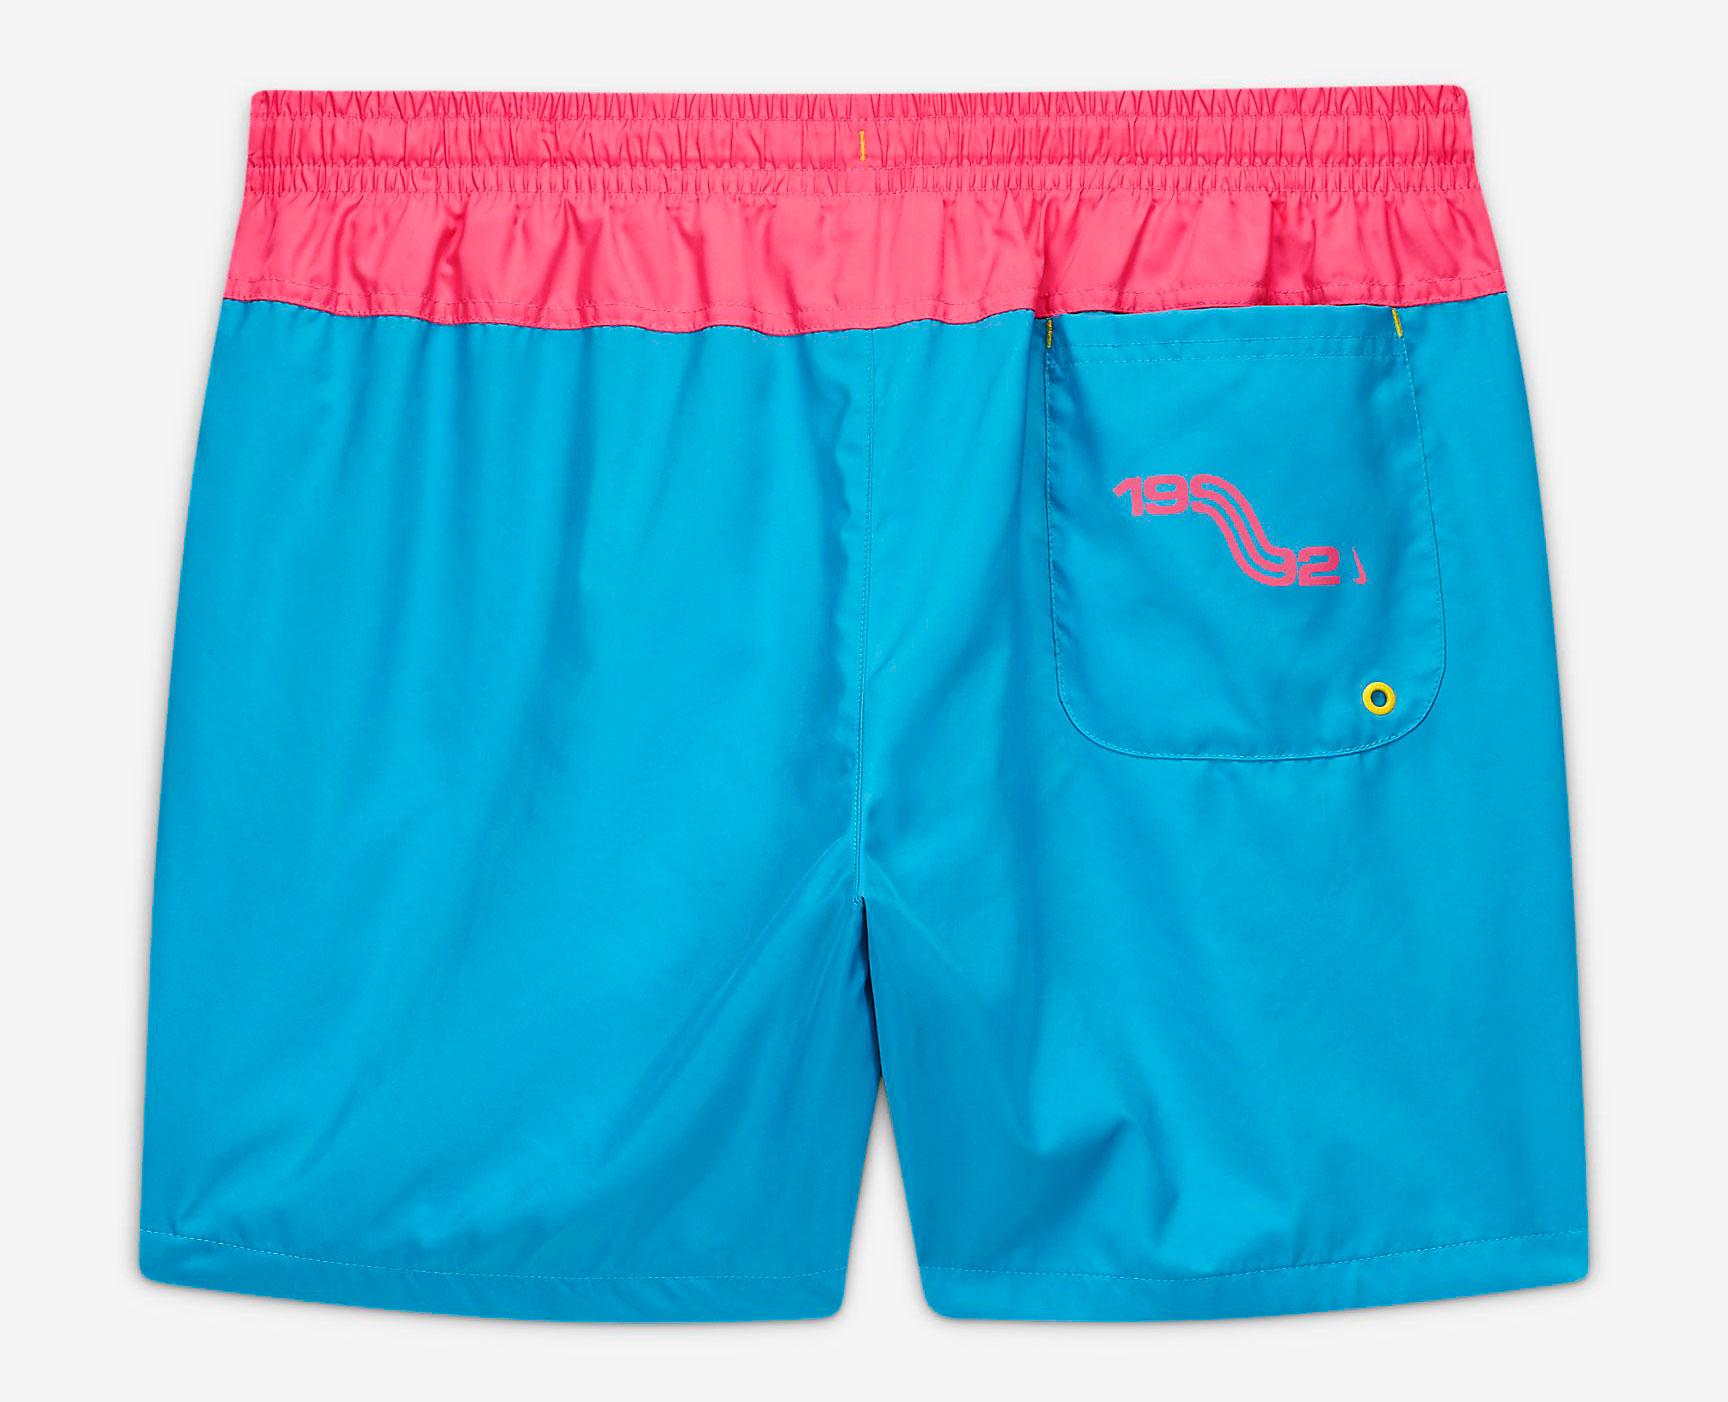 nike-kyrie-6-neon-graffiti-90s-shorts-blue-2